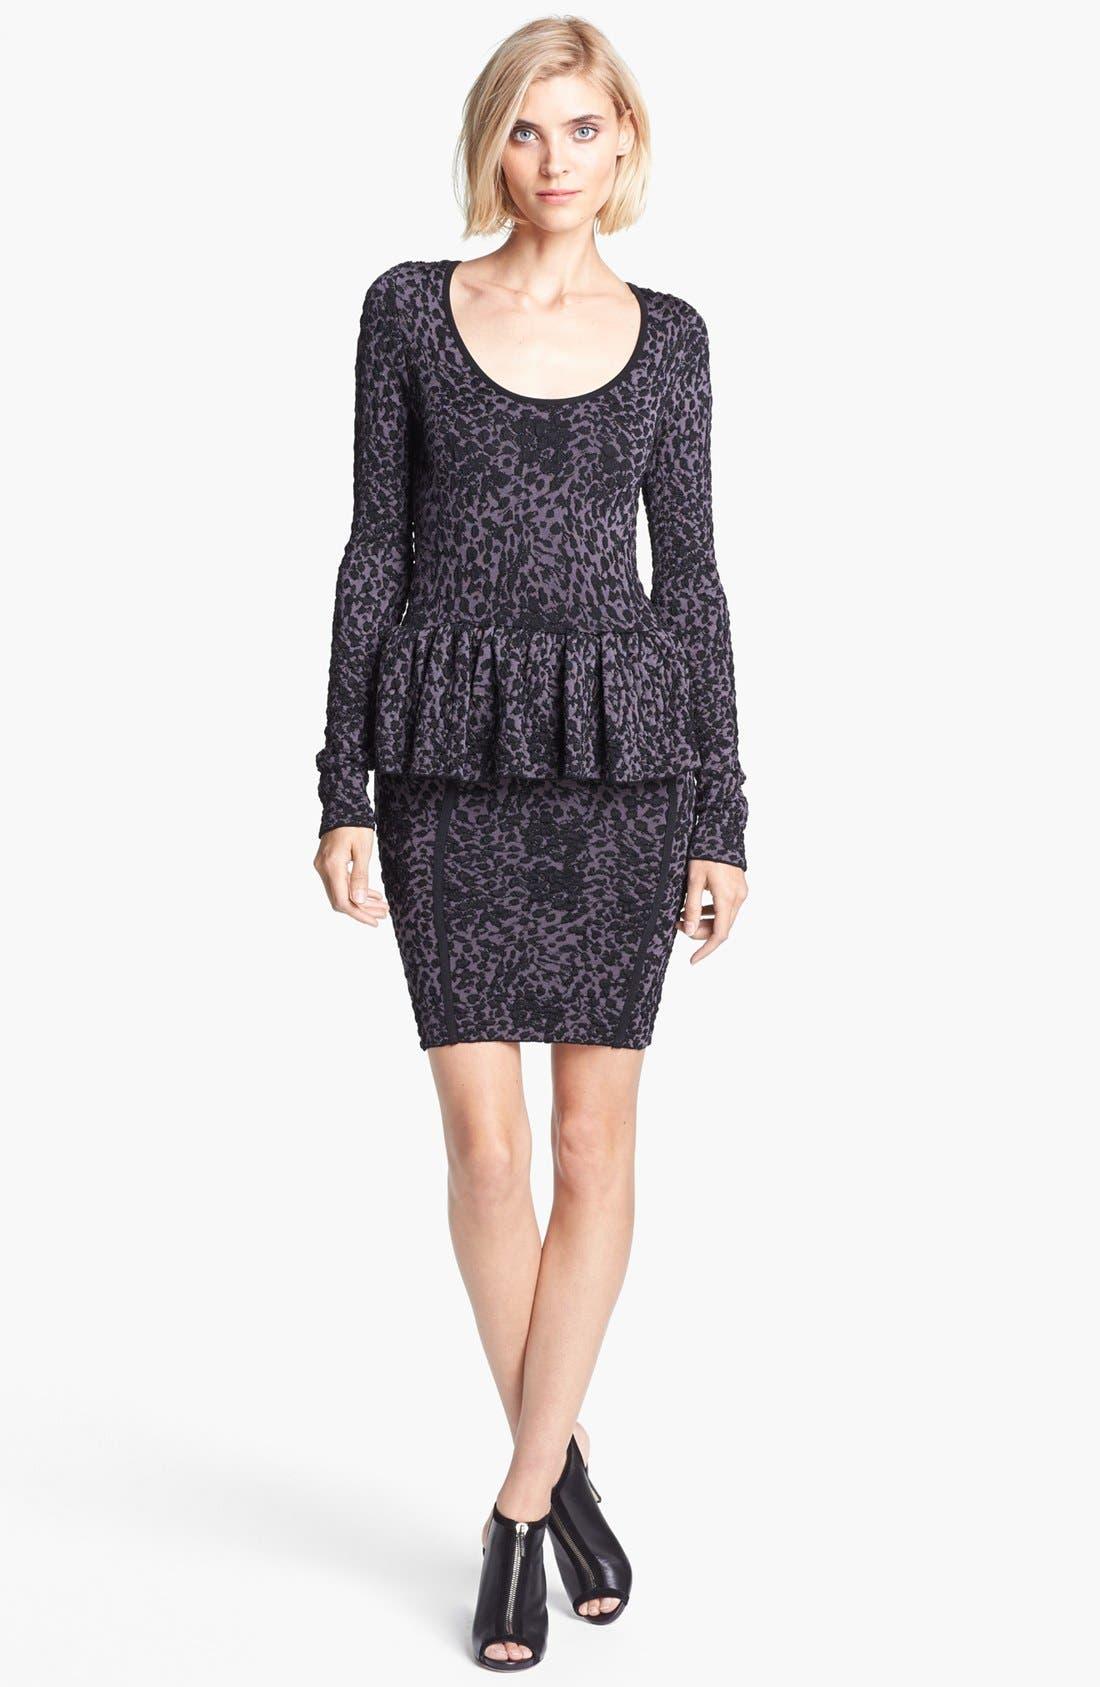 Alternate Image 1 Selected - Jay Godfrey Leopard Jacquard Knit Peplum Dress